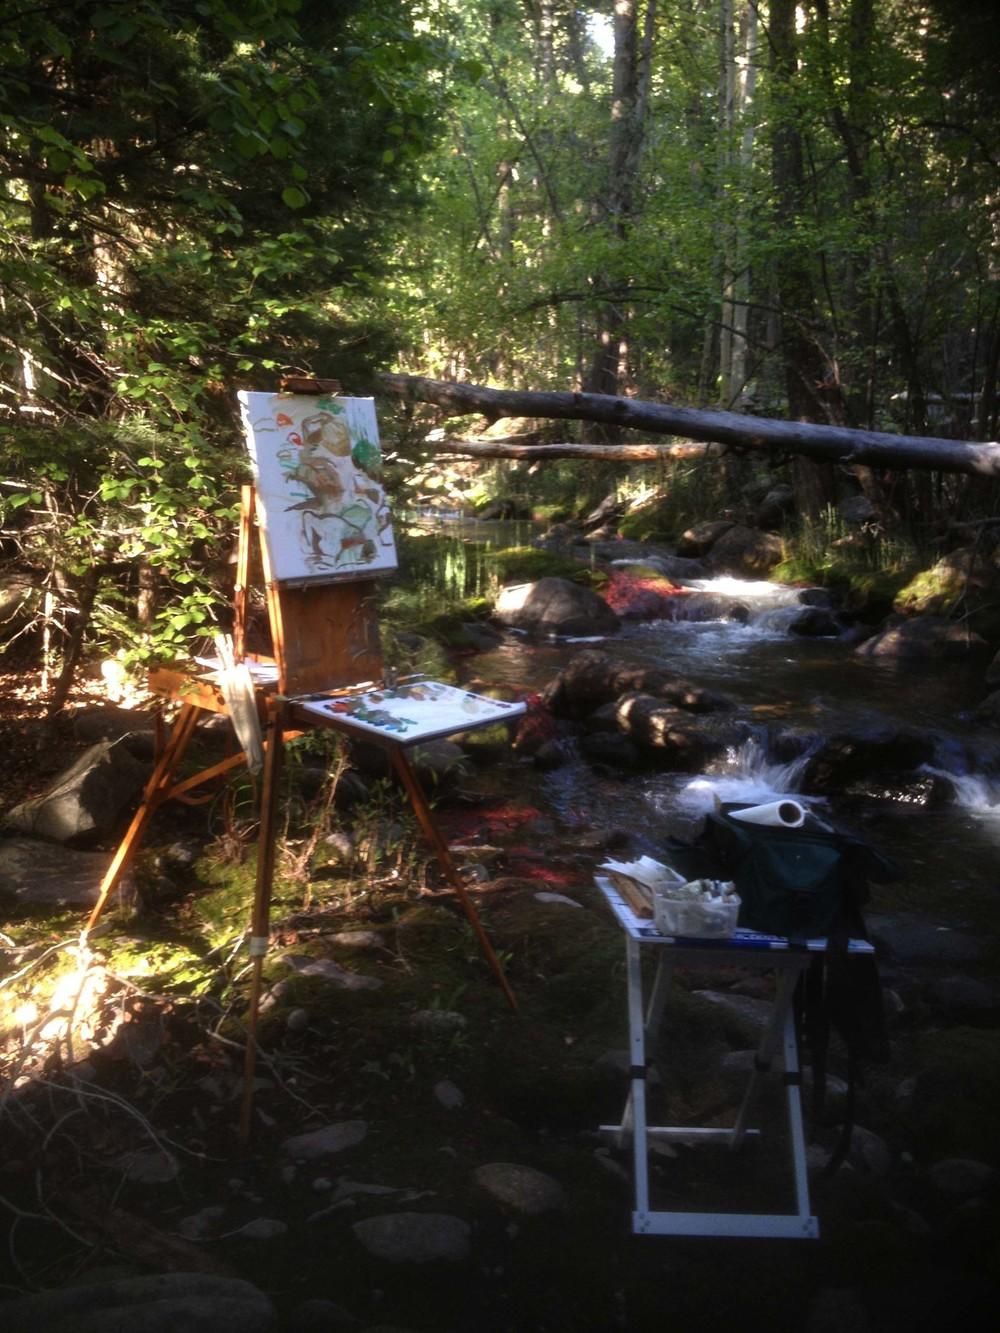 site-9.8.13 n. crestone creek 3.jpg